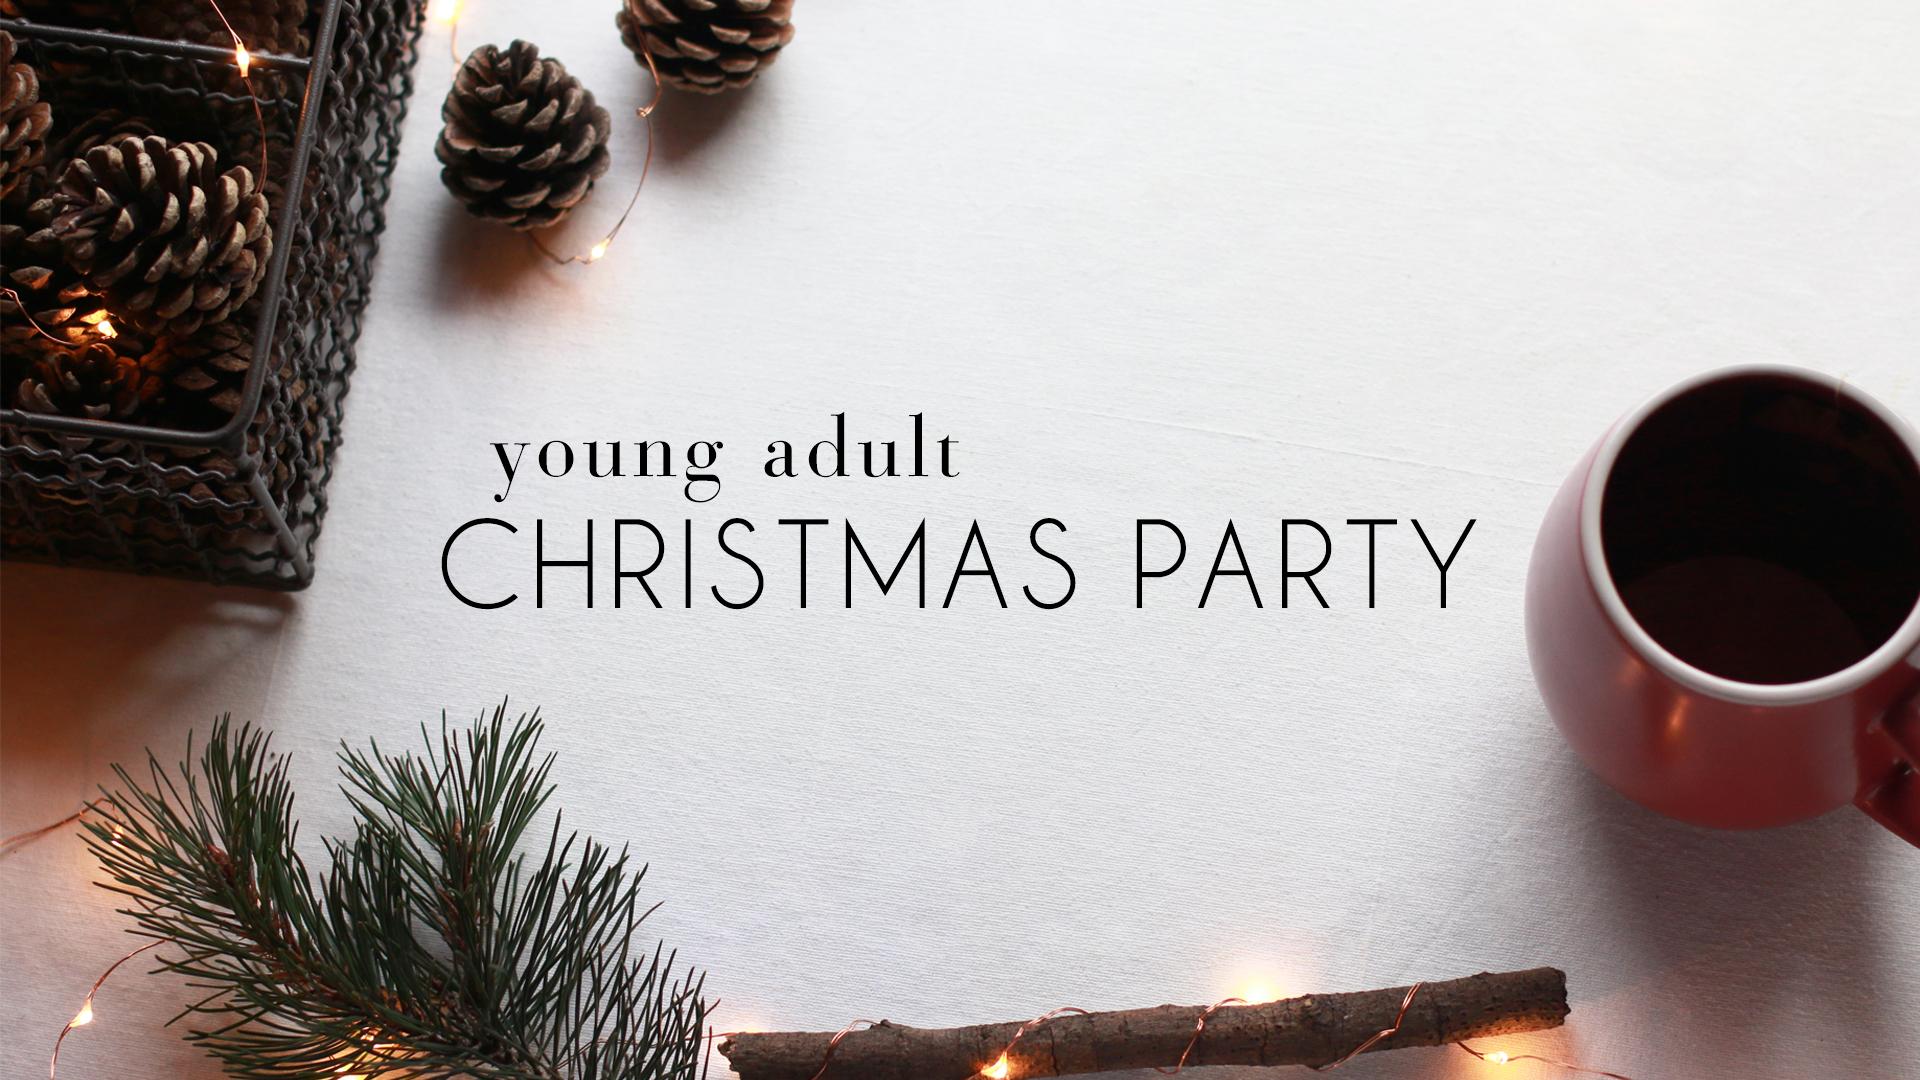 youngadultchristmas.jpg